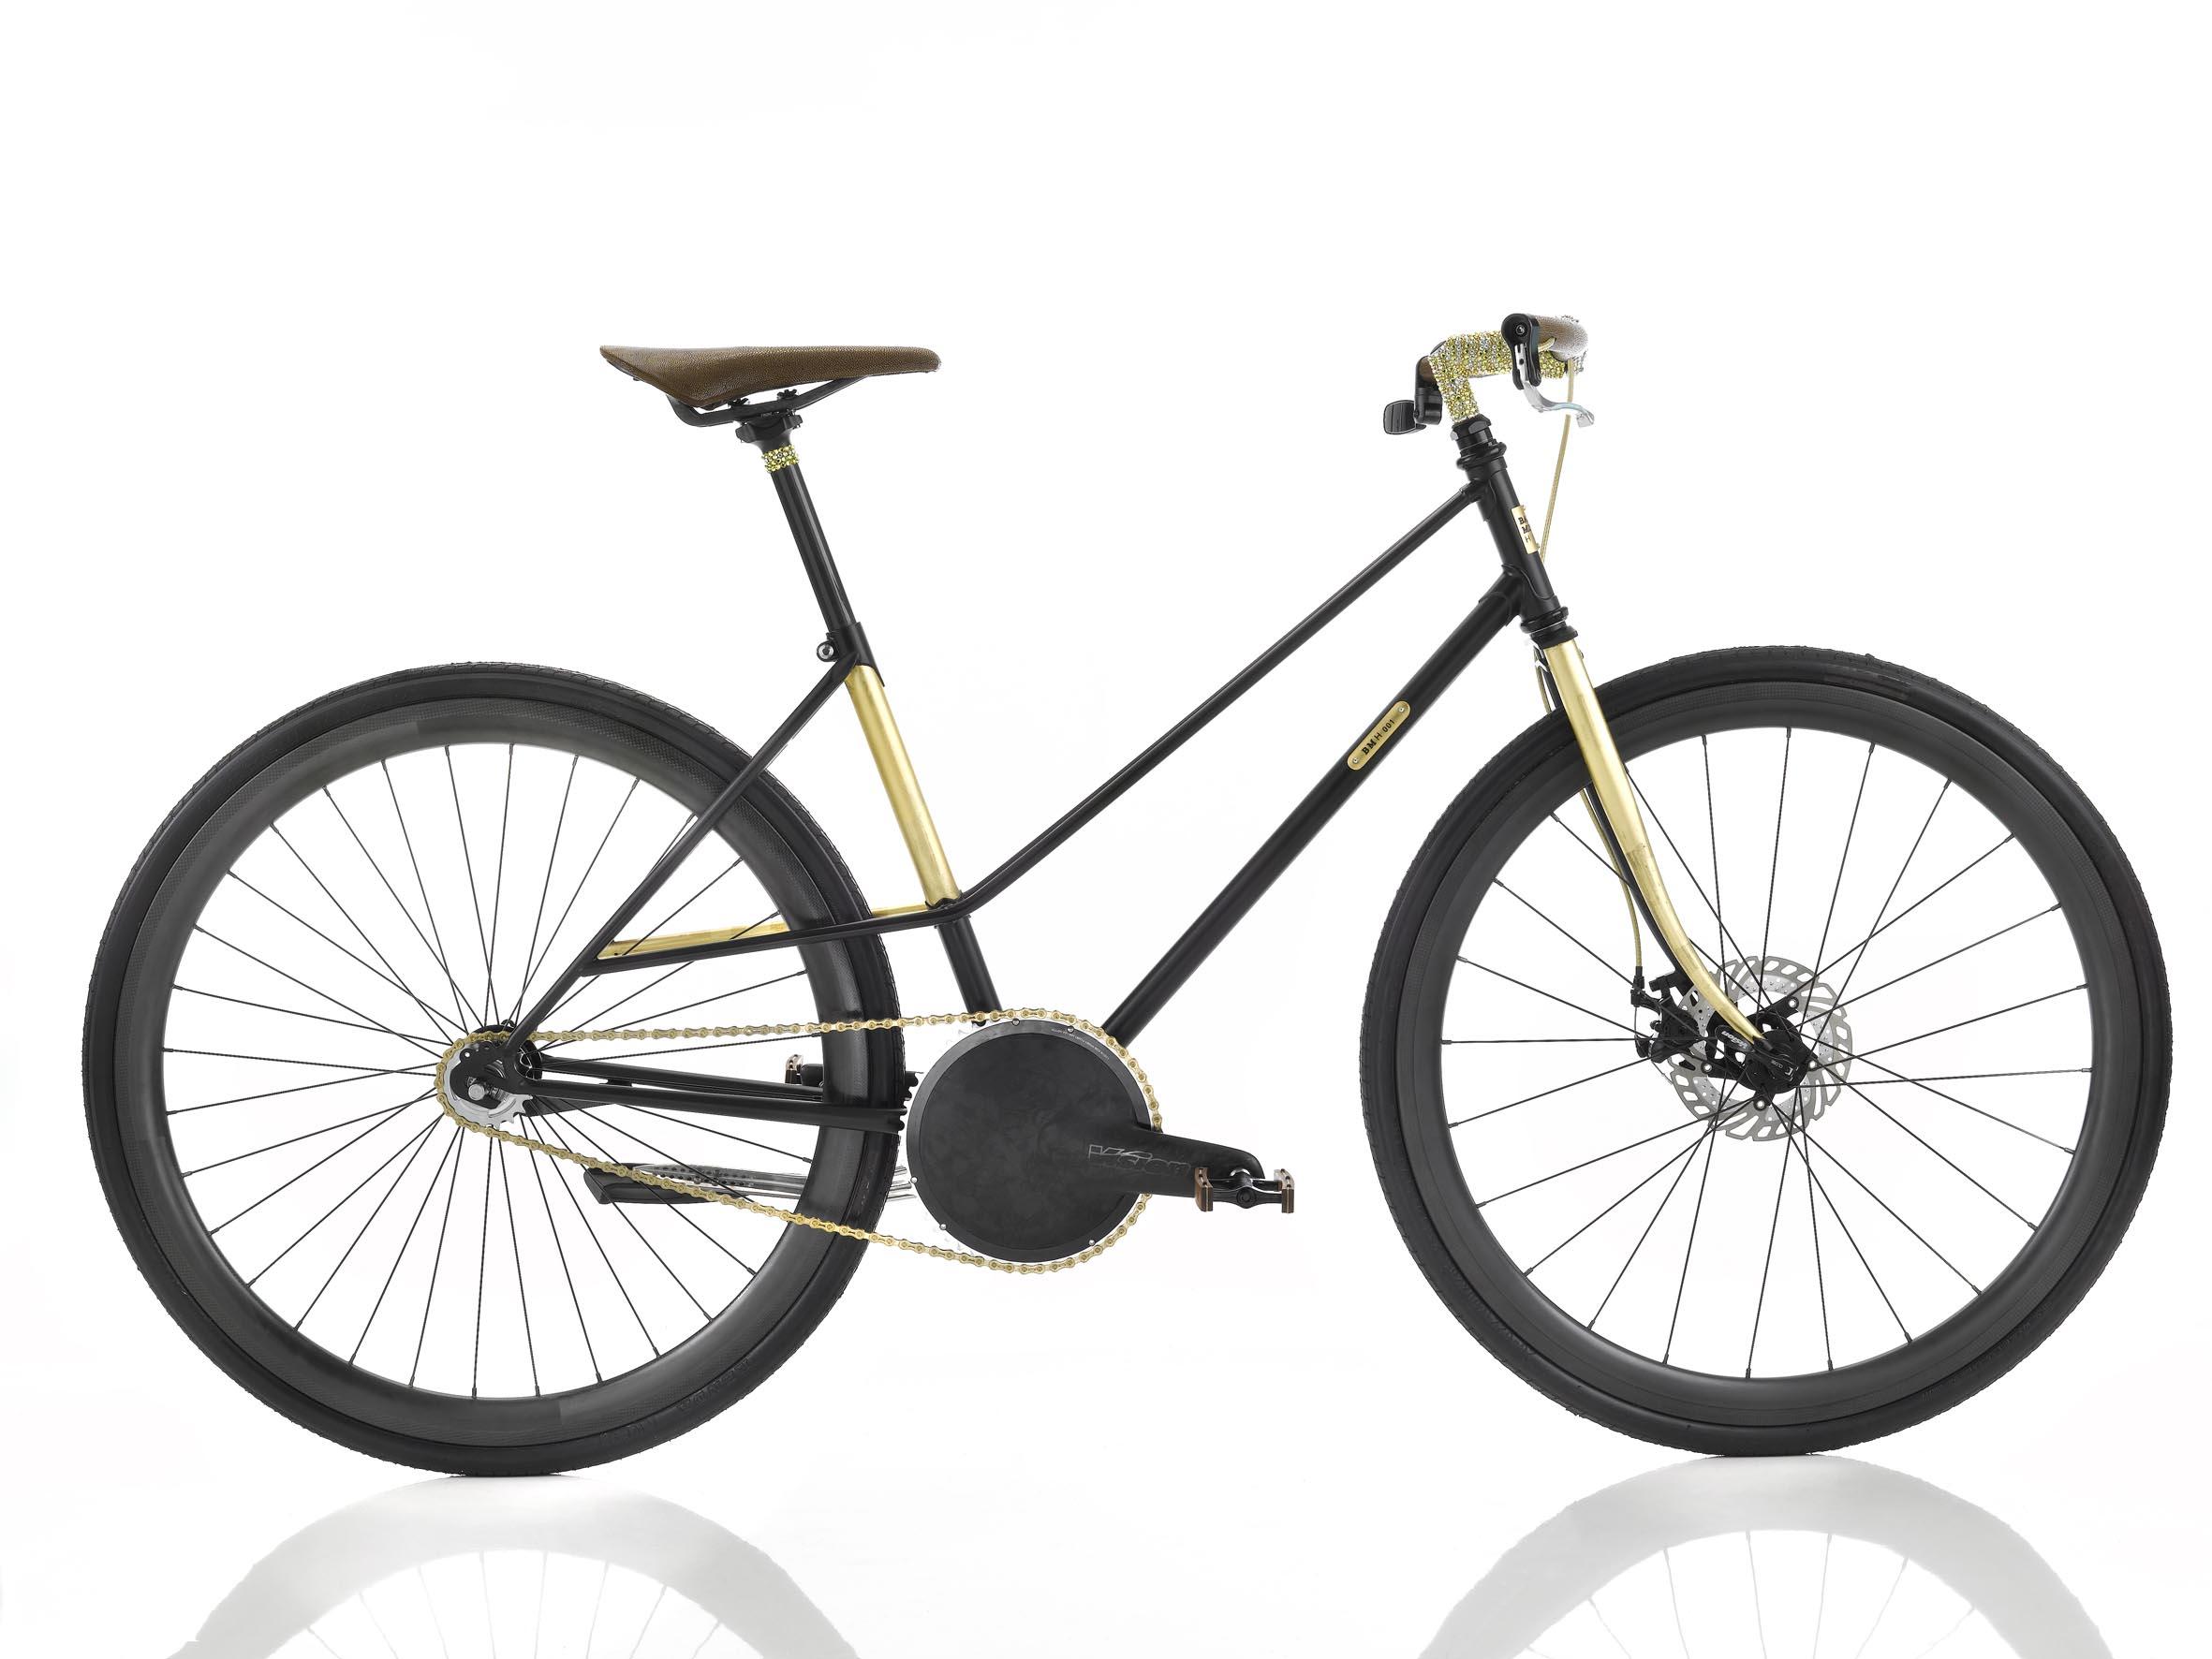 Badgley Mischka: la luxury bike